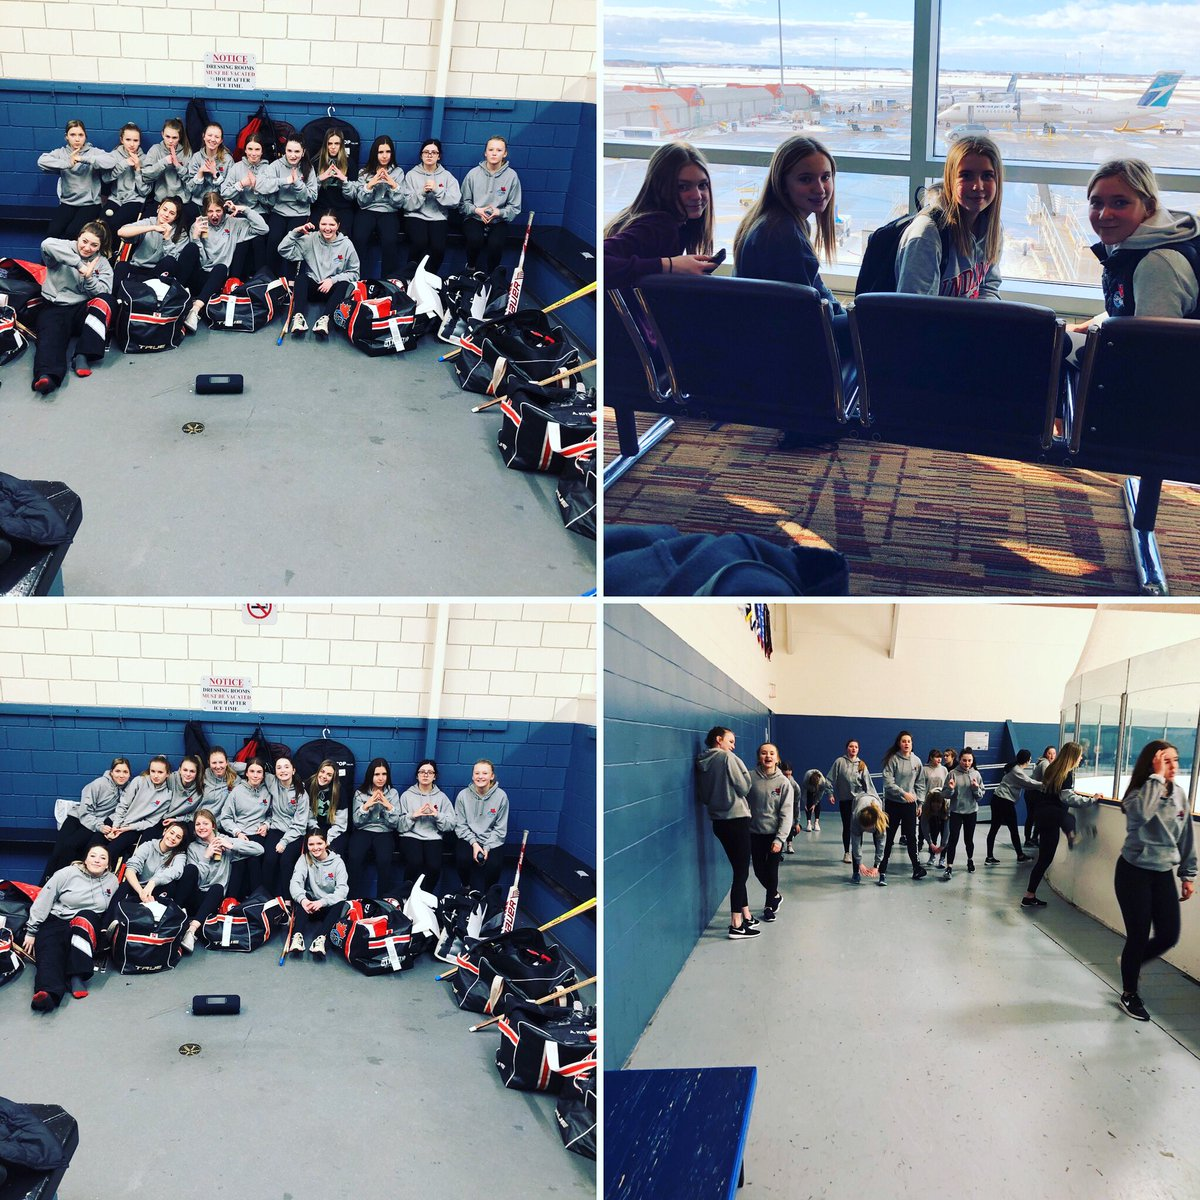 U16A Force have arrived at the Kelowna Sweetheart Tournament ready to play!! #spra #kelowna #ringettetournament pic.twitter.com/fa7bBQ0NSv